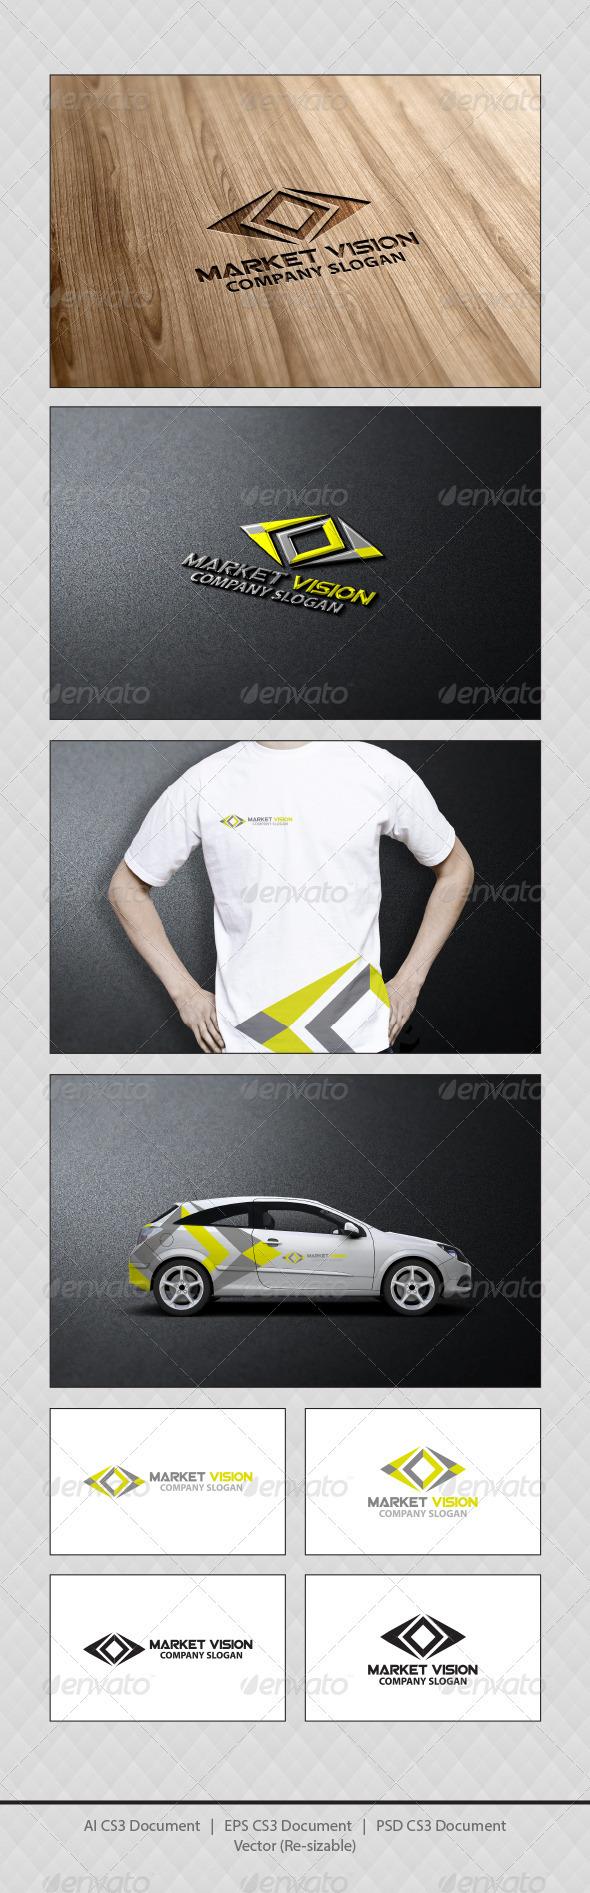 GraphicRiver Market Vision Logo Templates 3924363